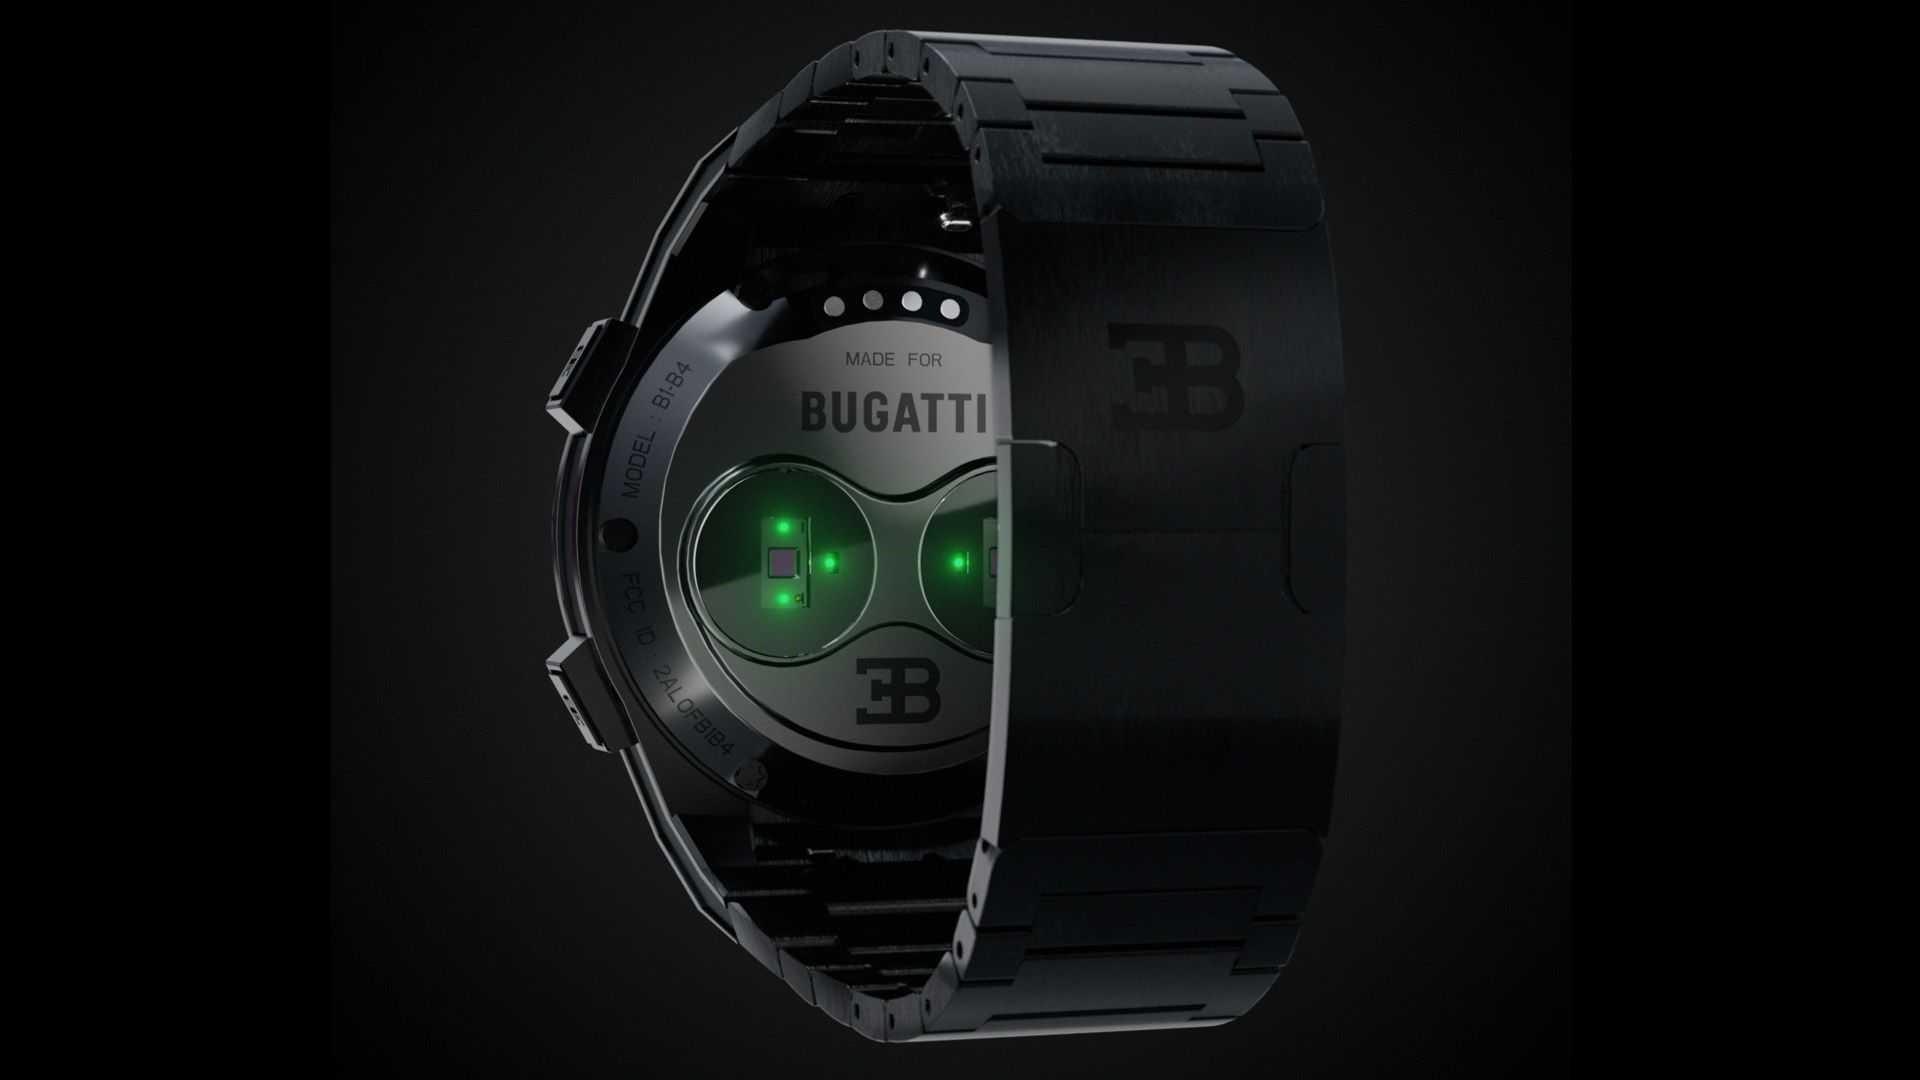 Bugatti_Smartwatch-0011